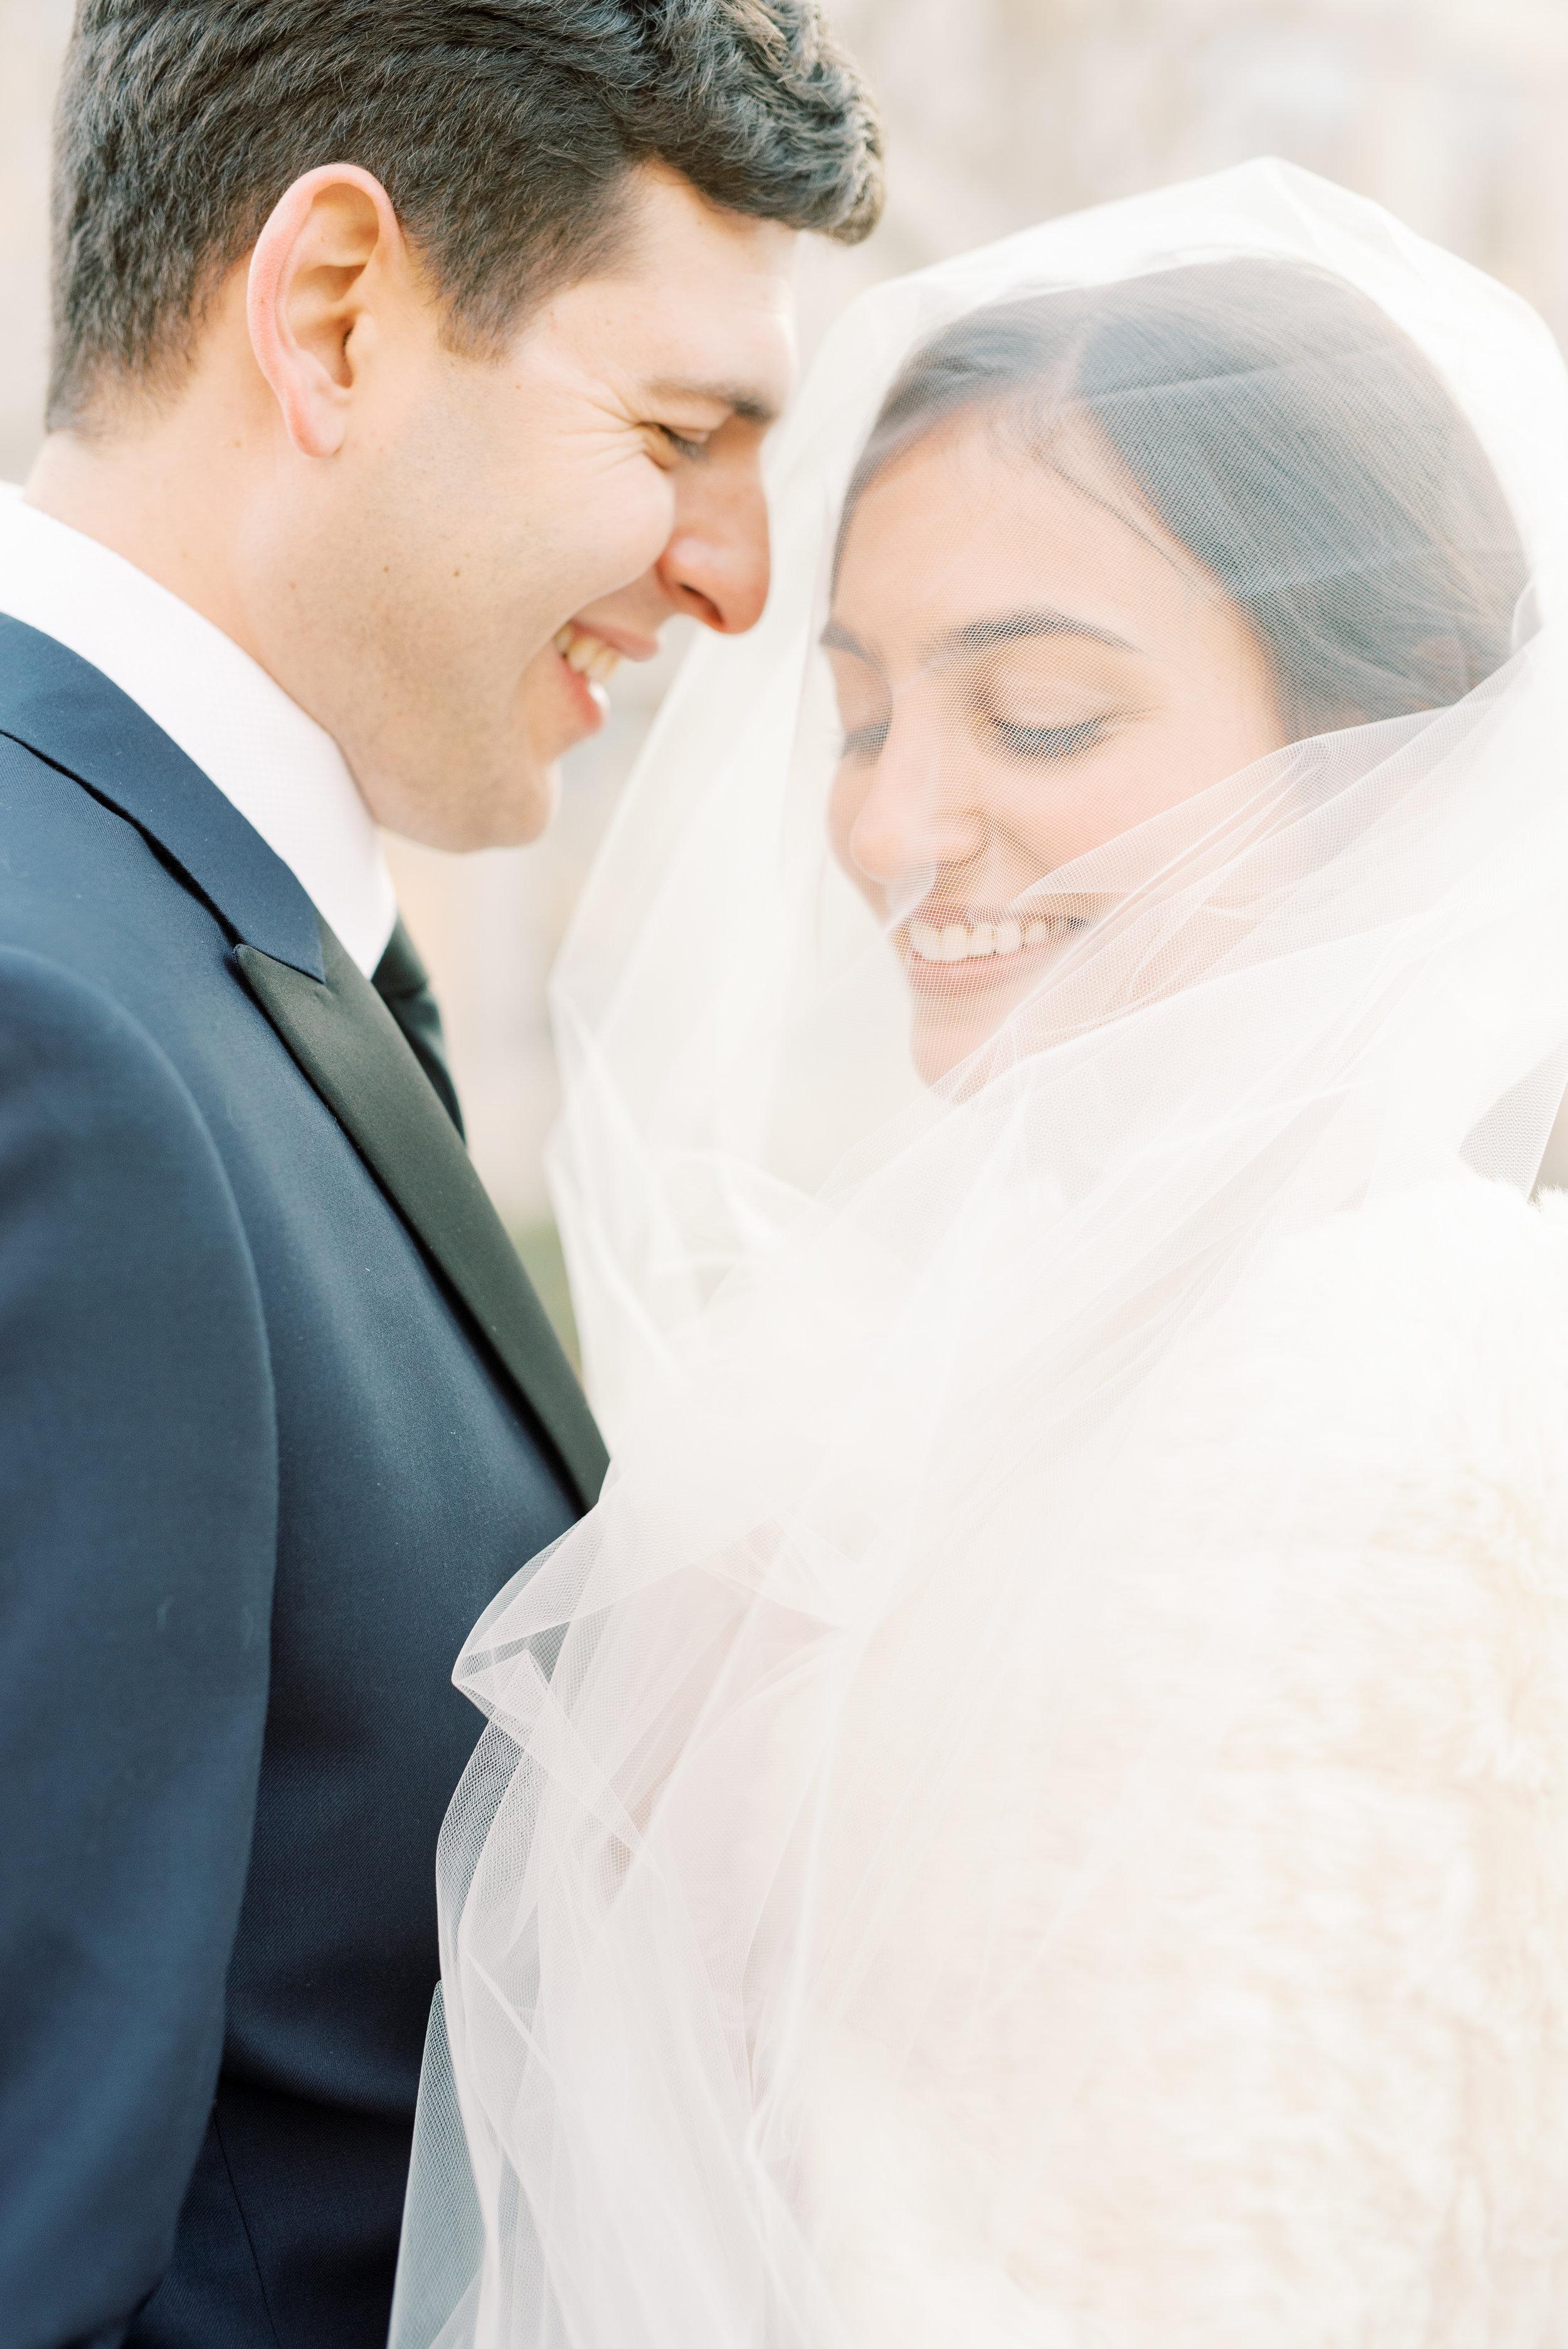 haley-richter-photography-classic-winter-union-trust-philadelphia-wedding-054.jpg